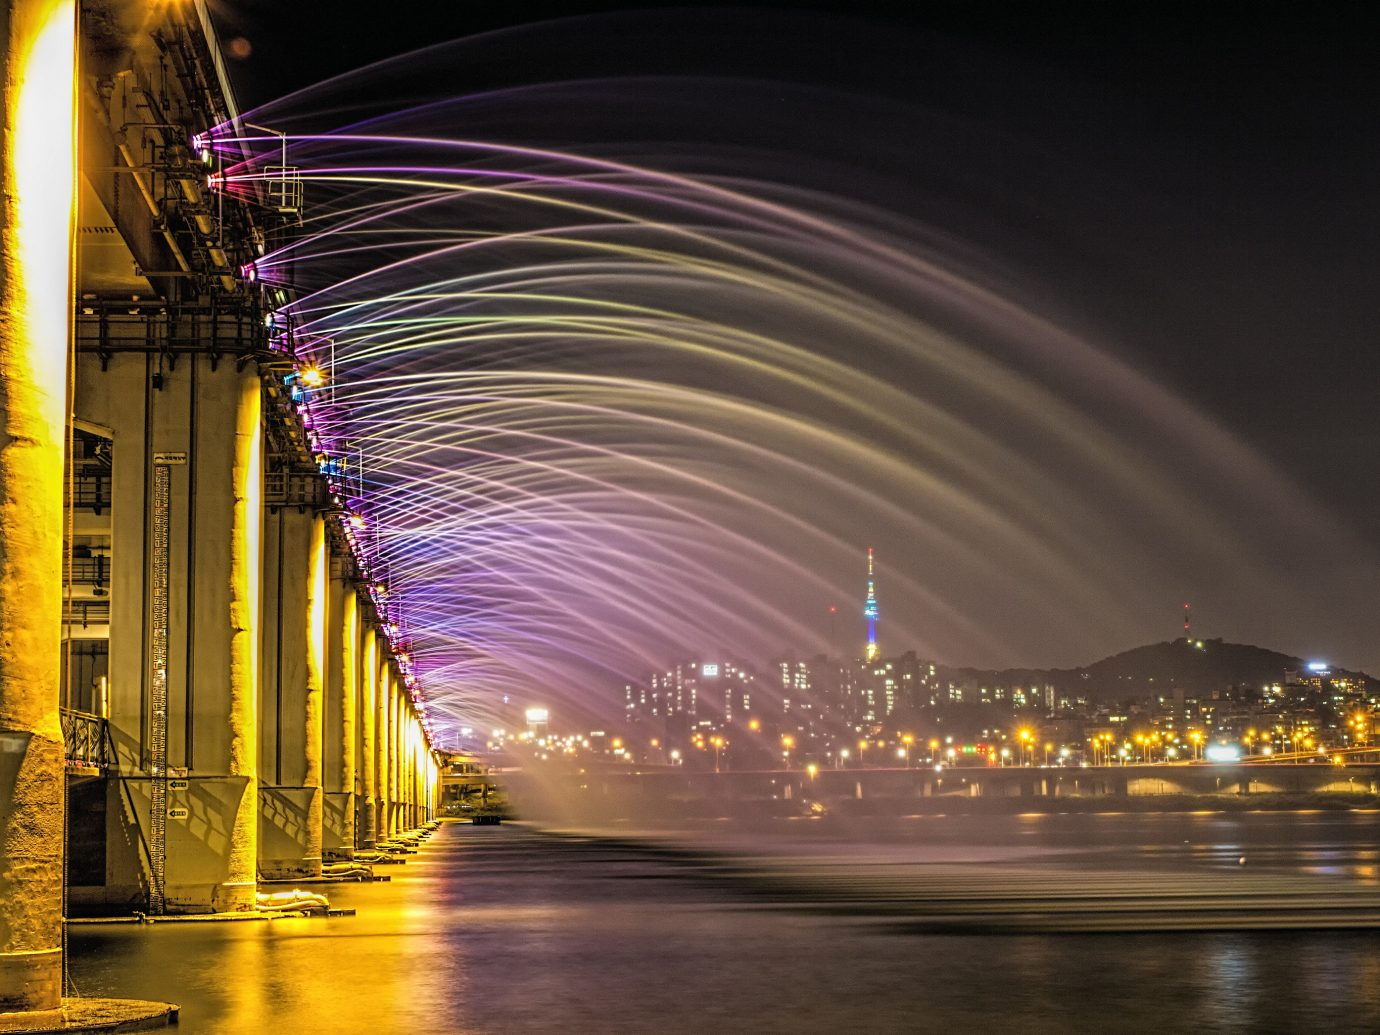 Offbeat outdoor night light reflection darkness cityscape evening lighting bridge infrastructure several